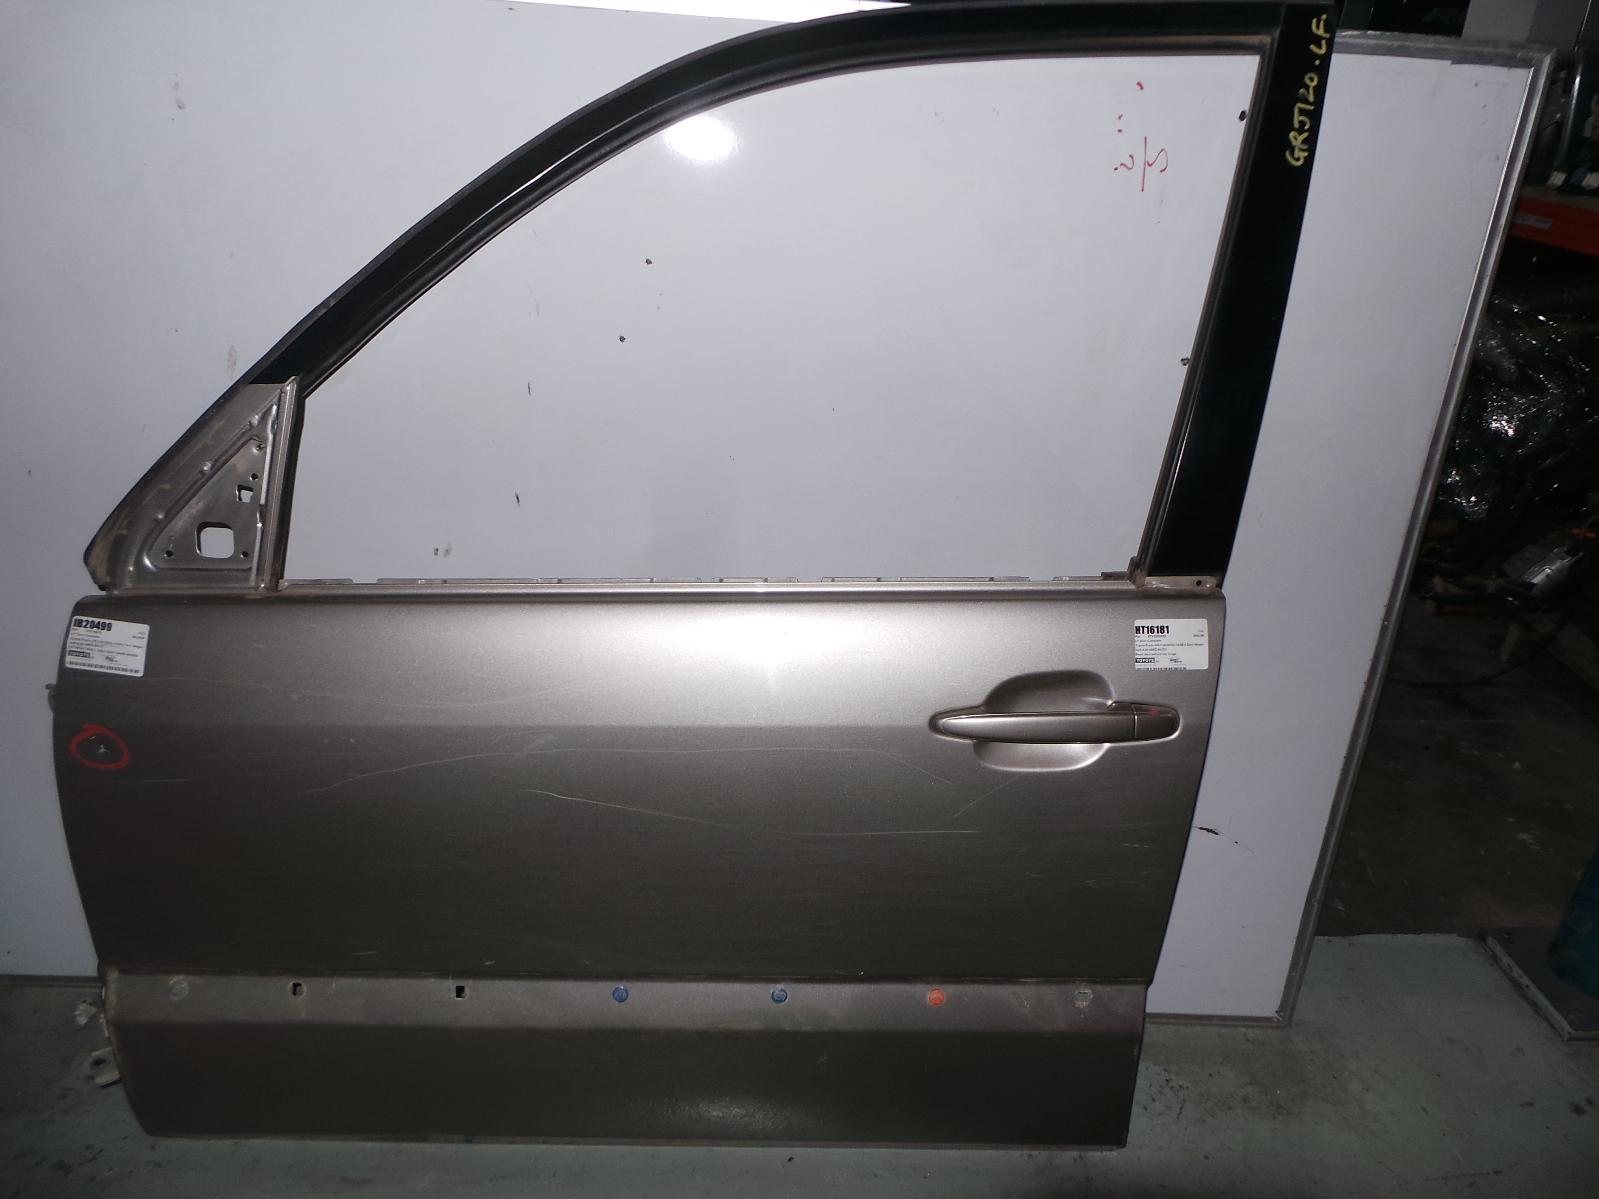 TOYOTA PRADO, Left Front Door, 120 SERIES, W/ FLARE TYPE, 02/03-10/09